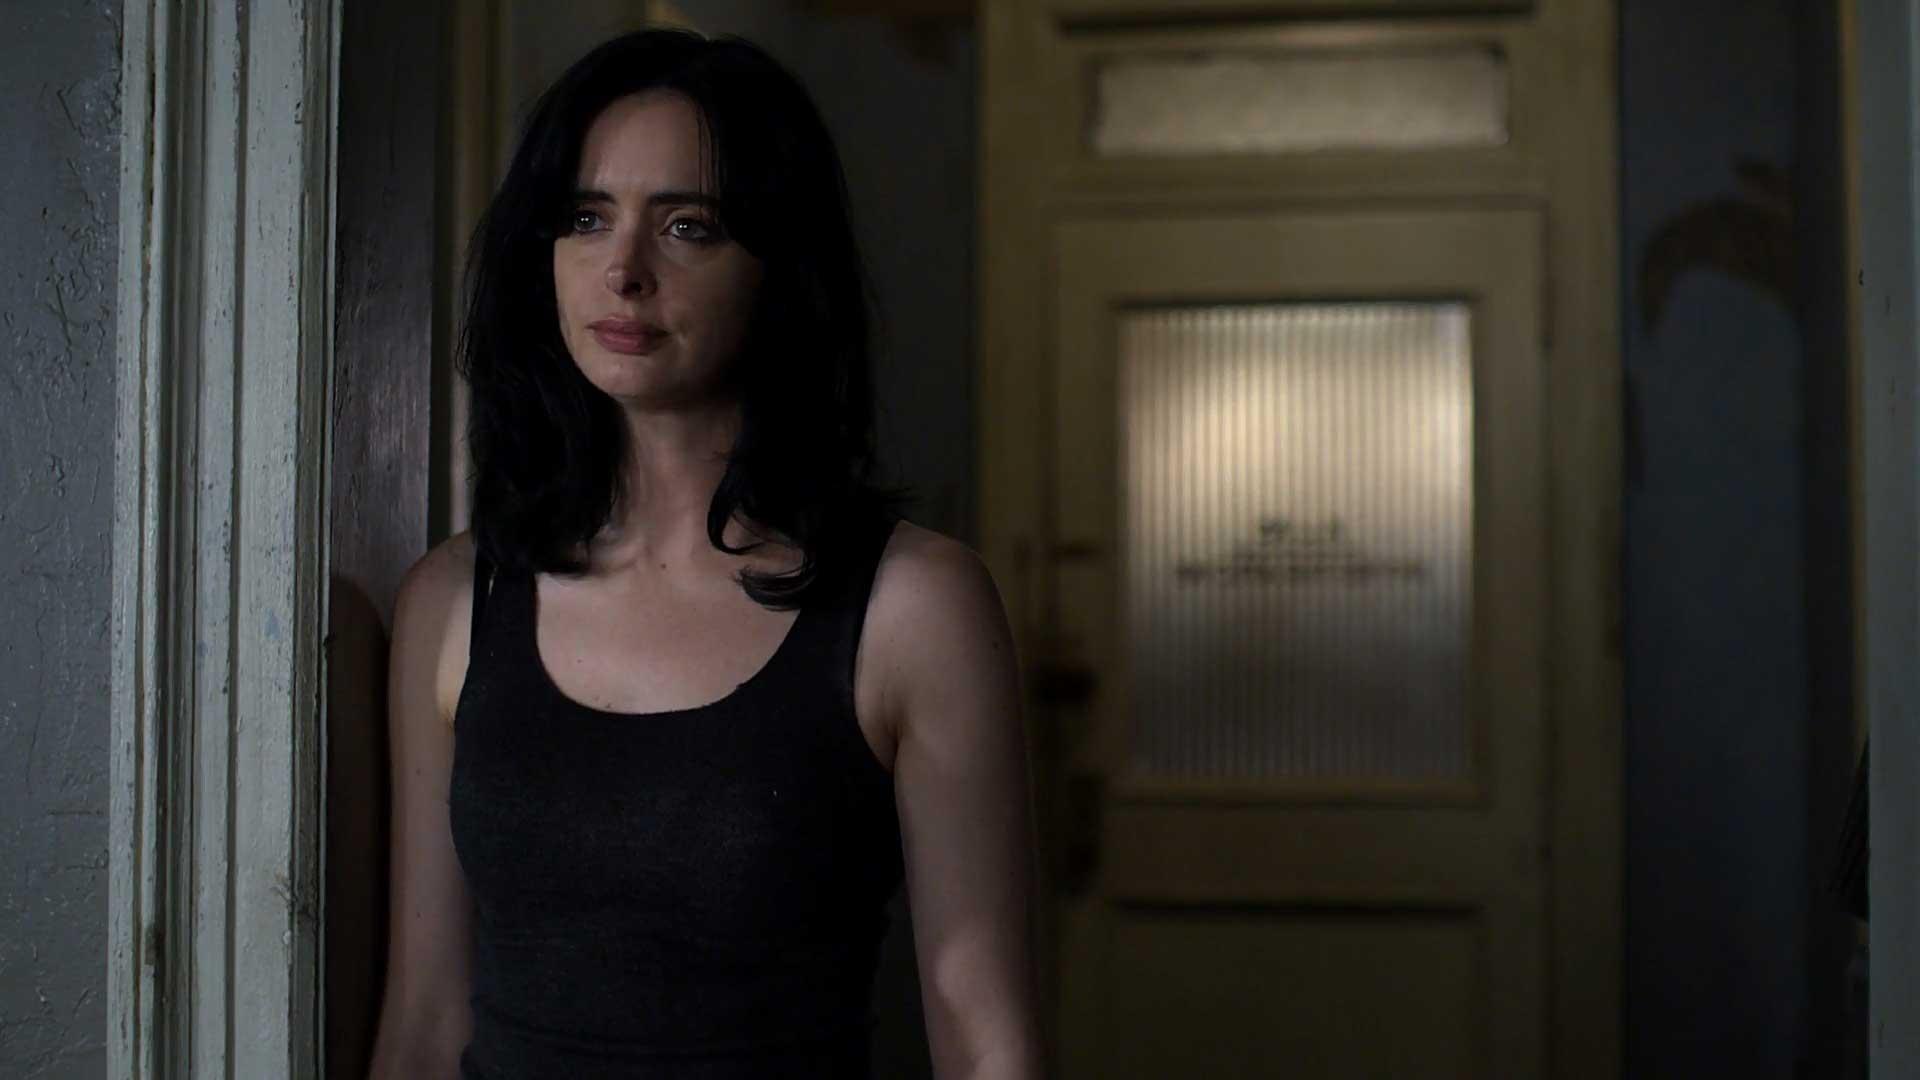 Jessica Jones Season 3 Episode 1 Review: AKA The Perfect